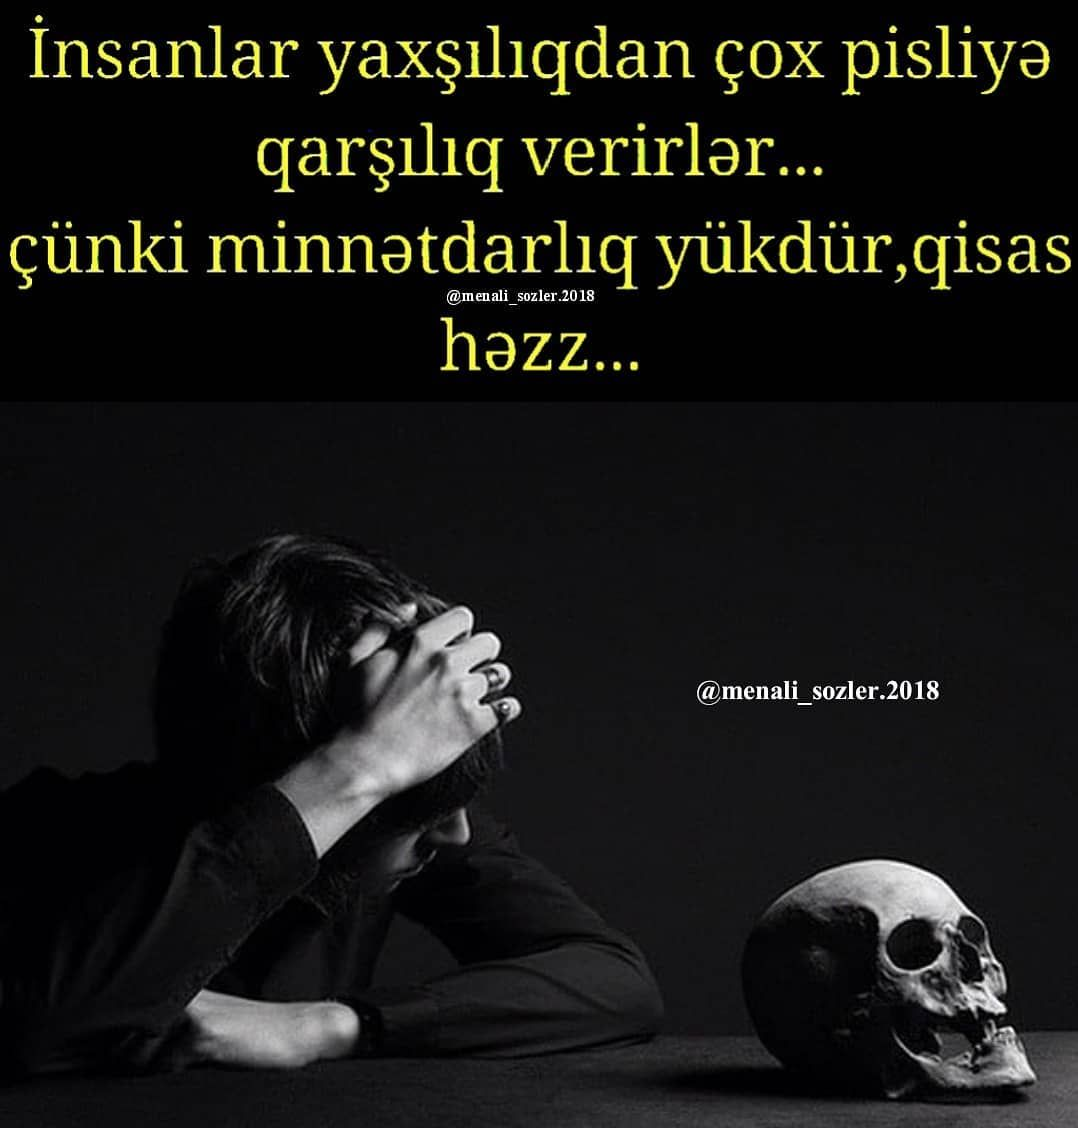 Fikirlerinizi Yorumlarda Yazin Menali Sozler 2018 Azerbaycan Azerbaijan Aztgram Baku Baki Gence Hikaye Azeri Azerbay Poster Movie Posters Movies